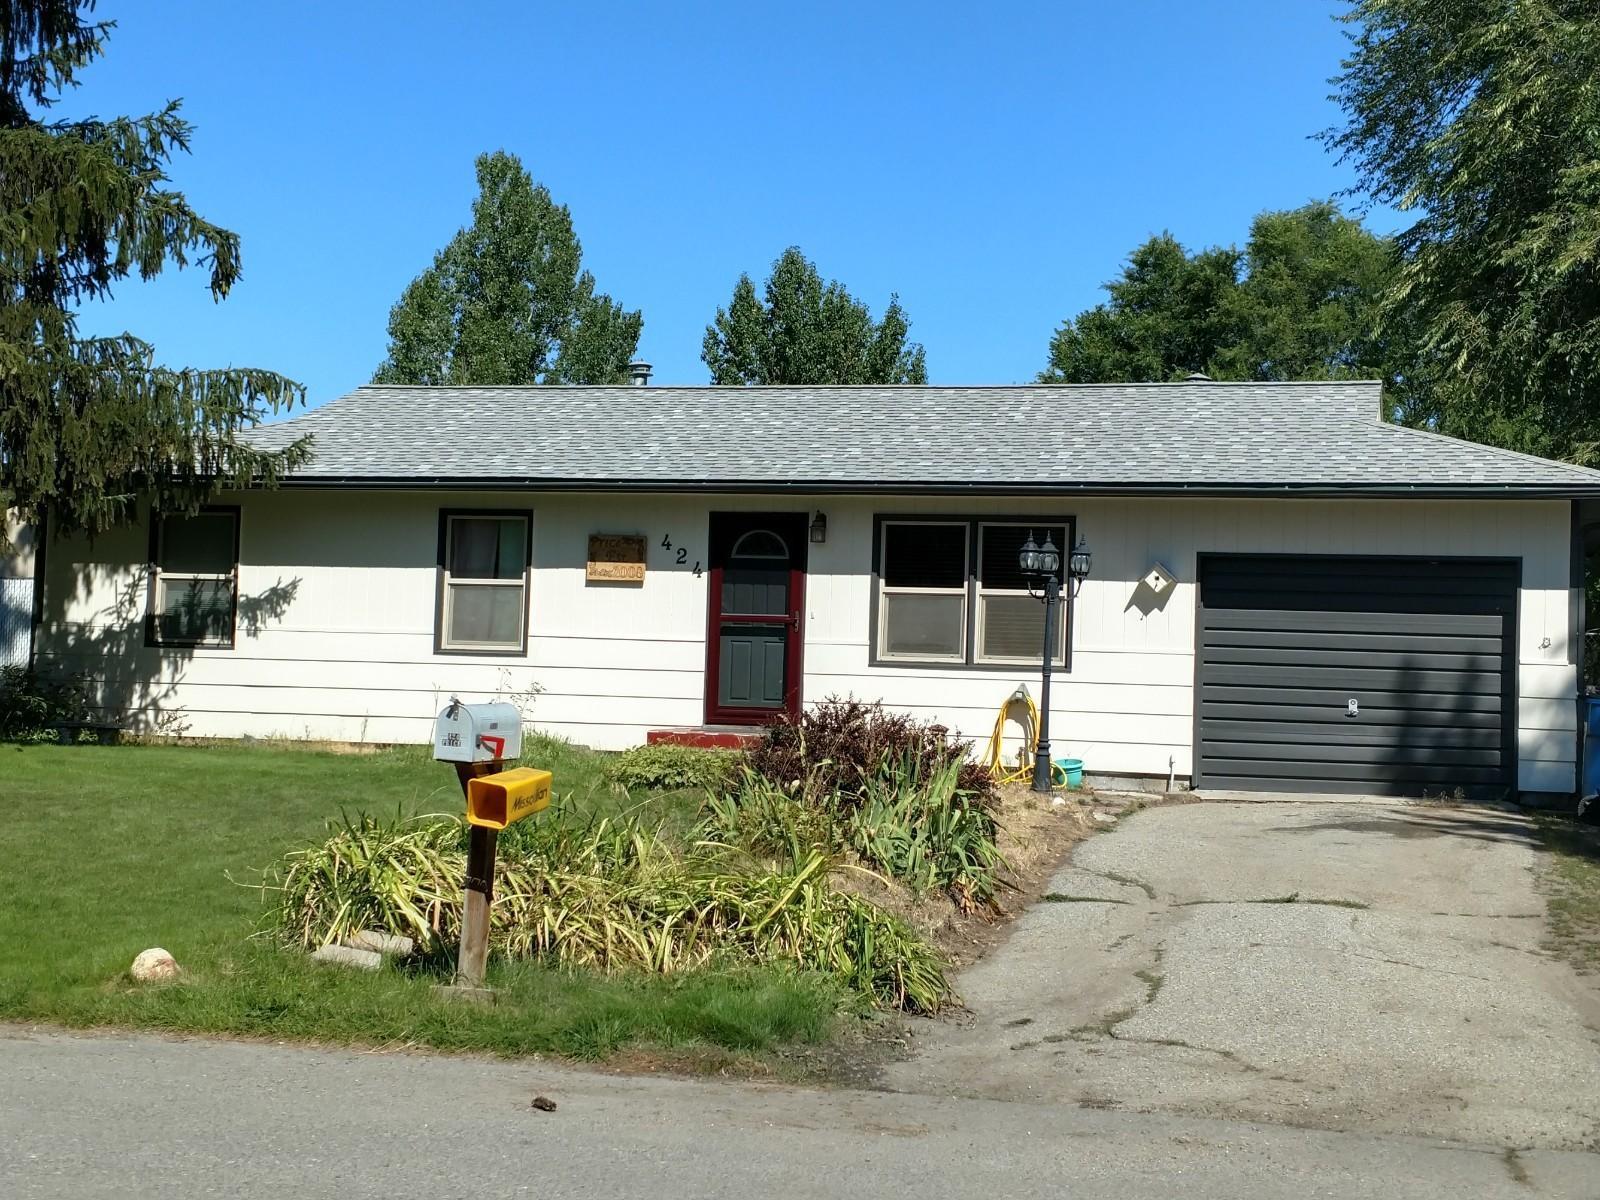 424 Tyler Way, Lolo, MT 59847